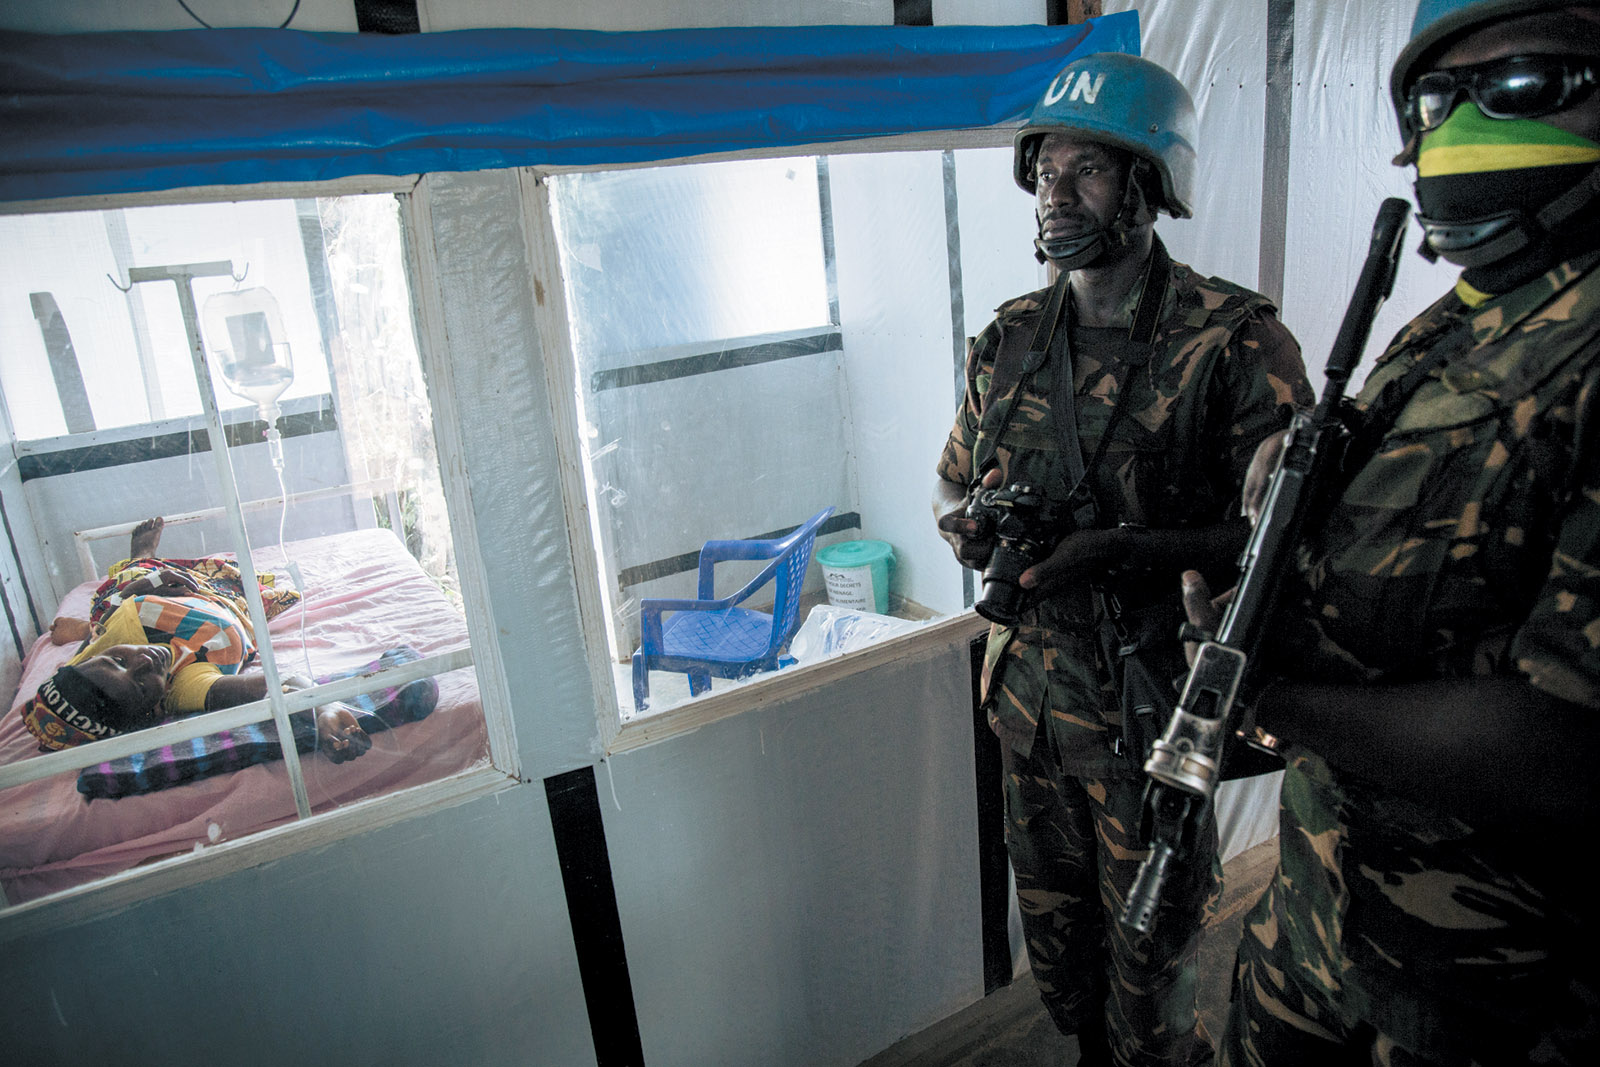 UN peacekeepers in an Ebola treatment center, Mangina, North Kivu, Congo